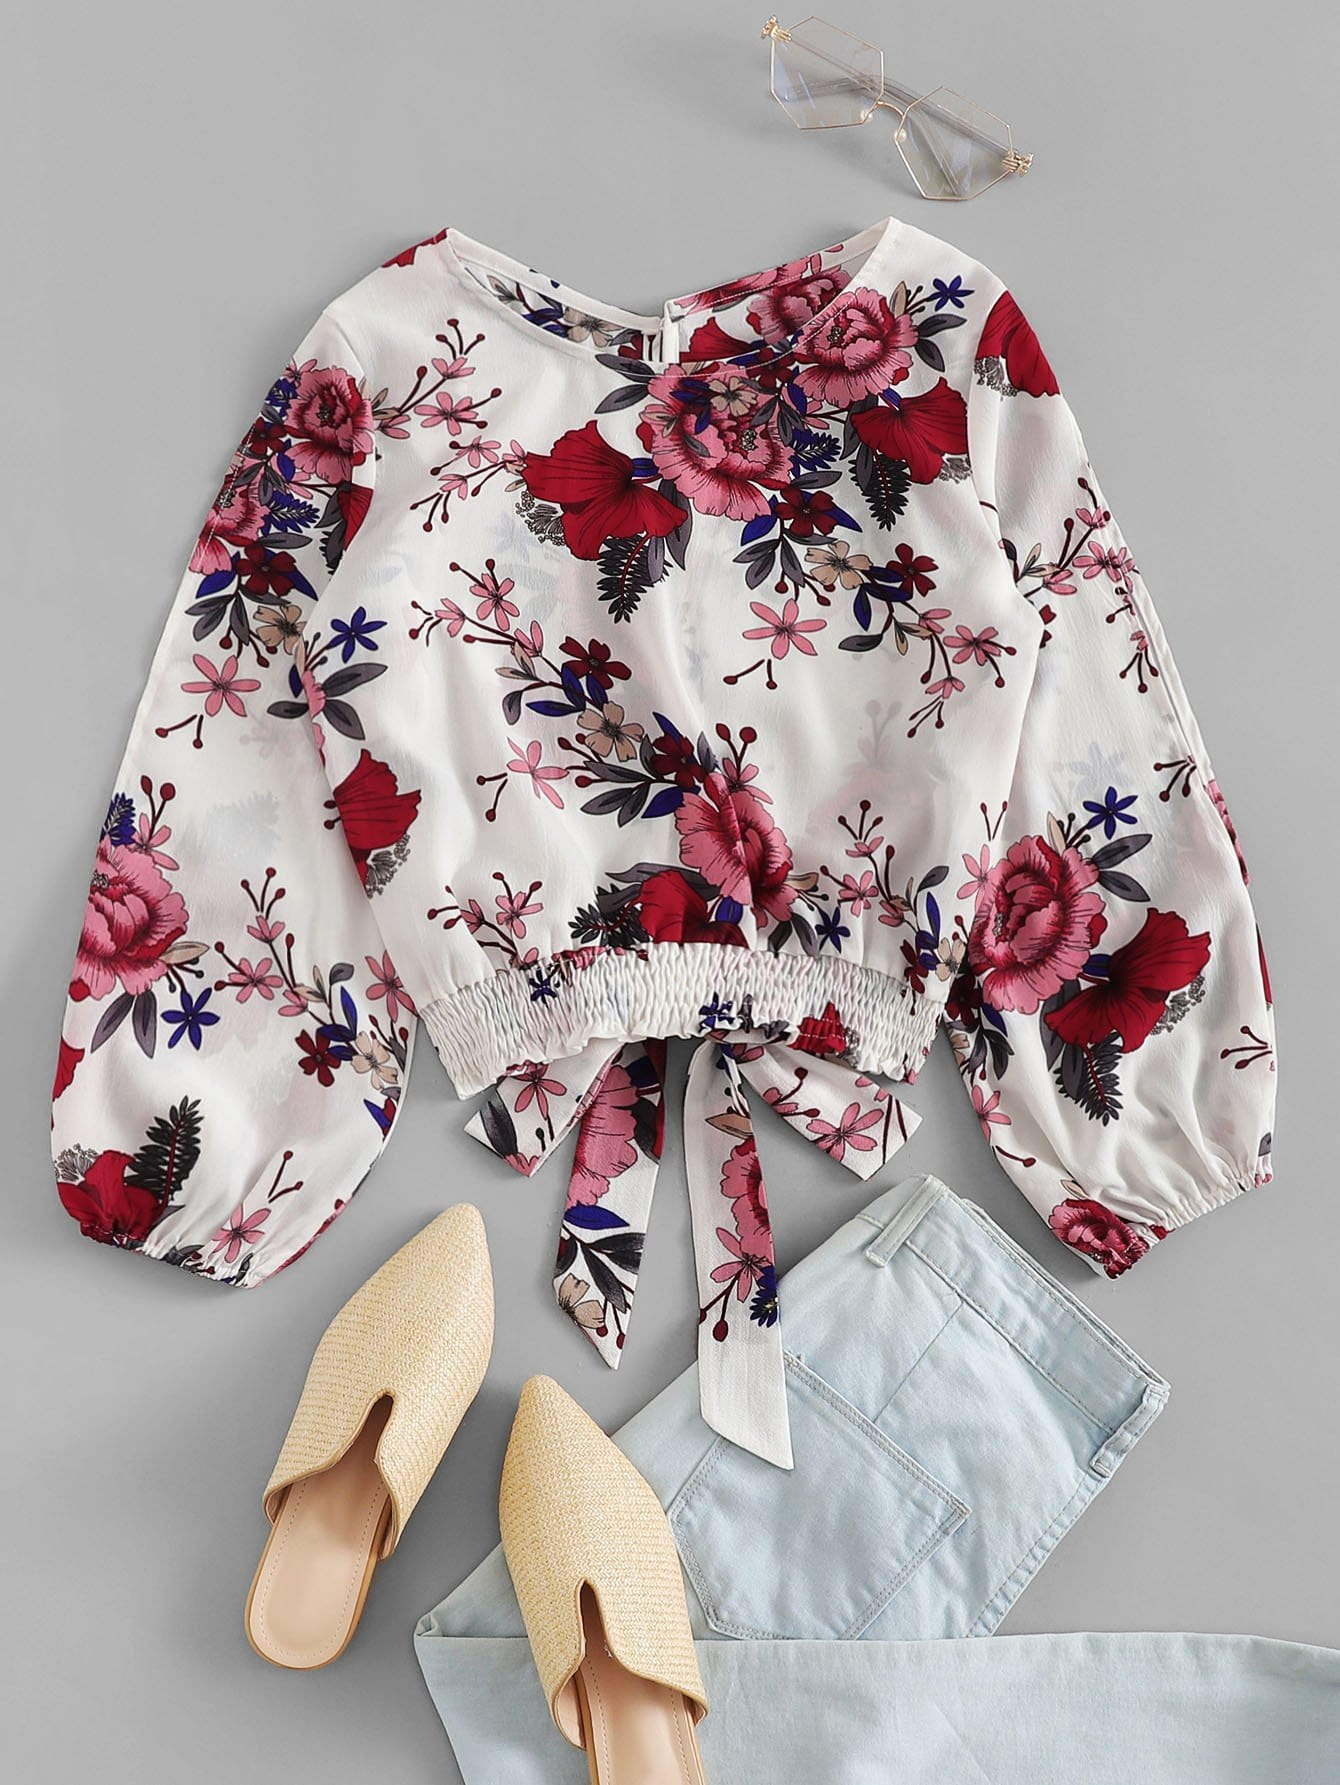 Bow Tie Front Floral Blouse